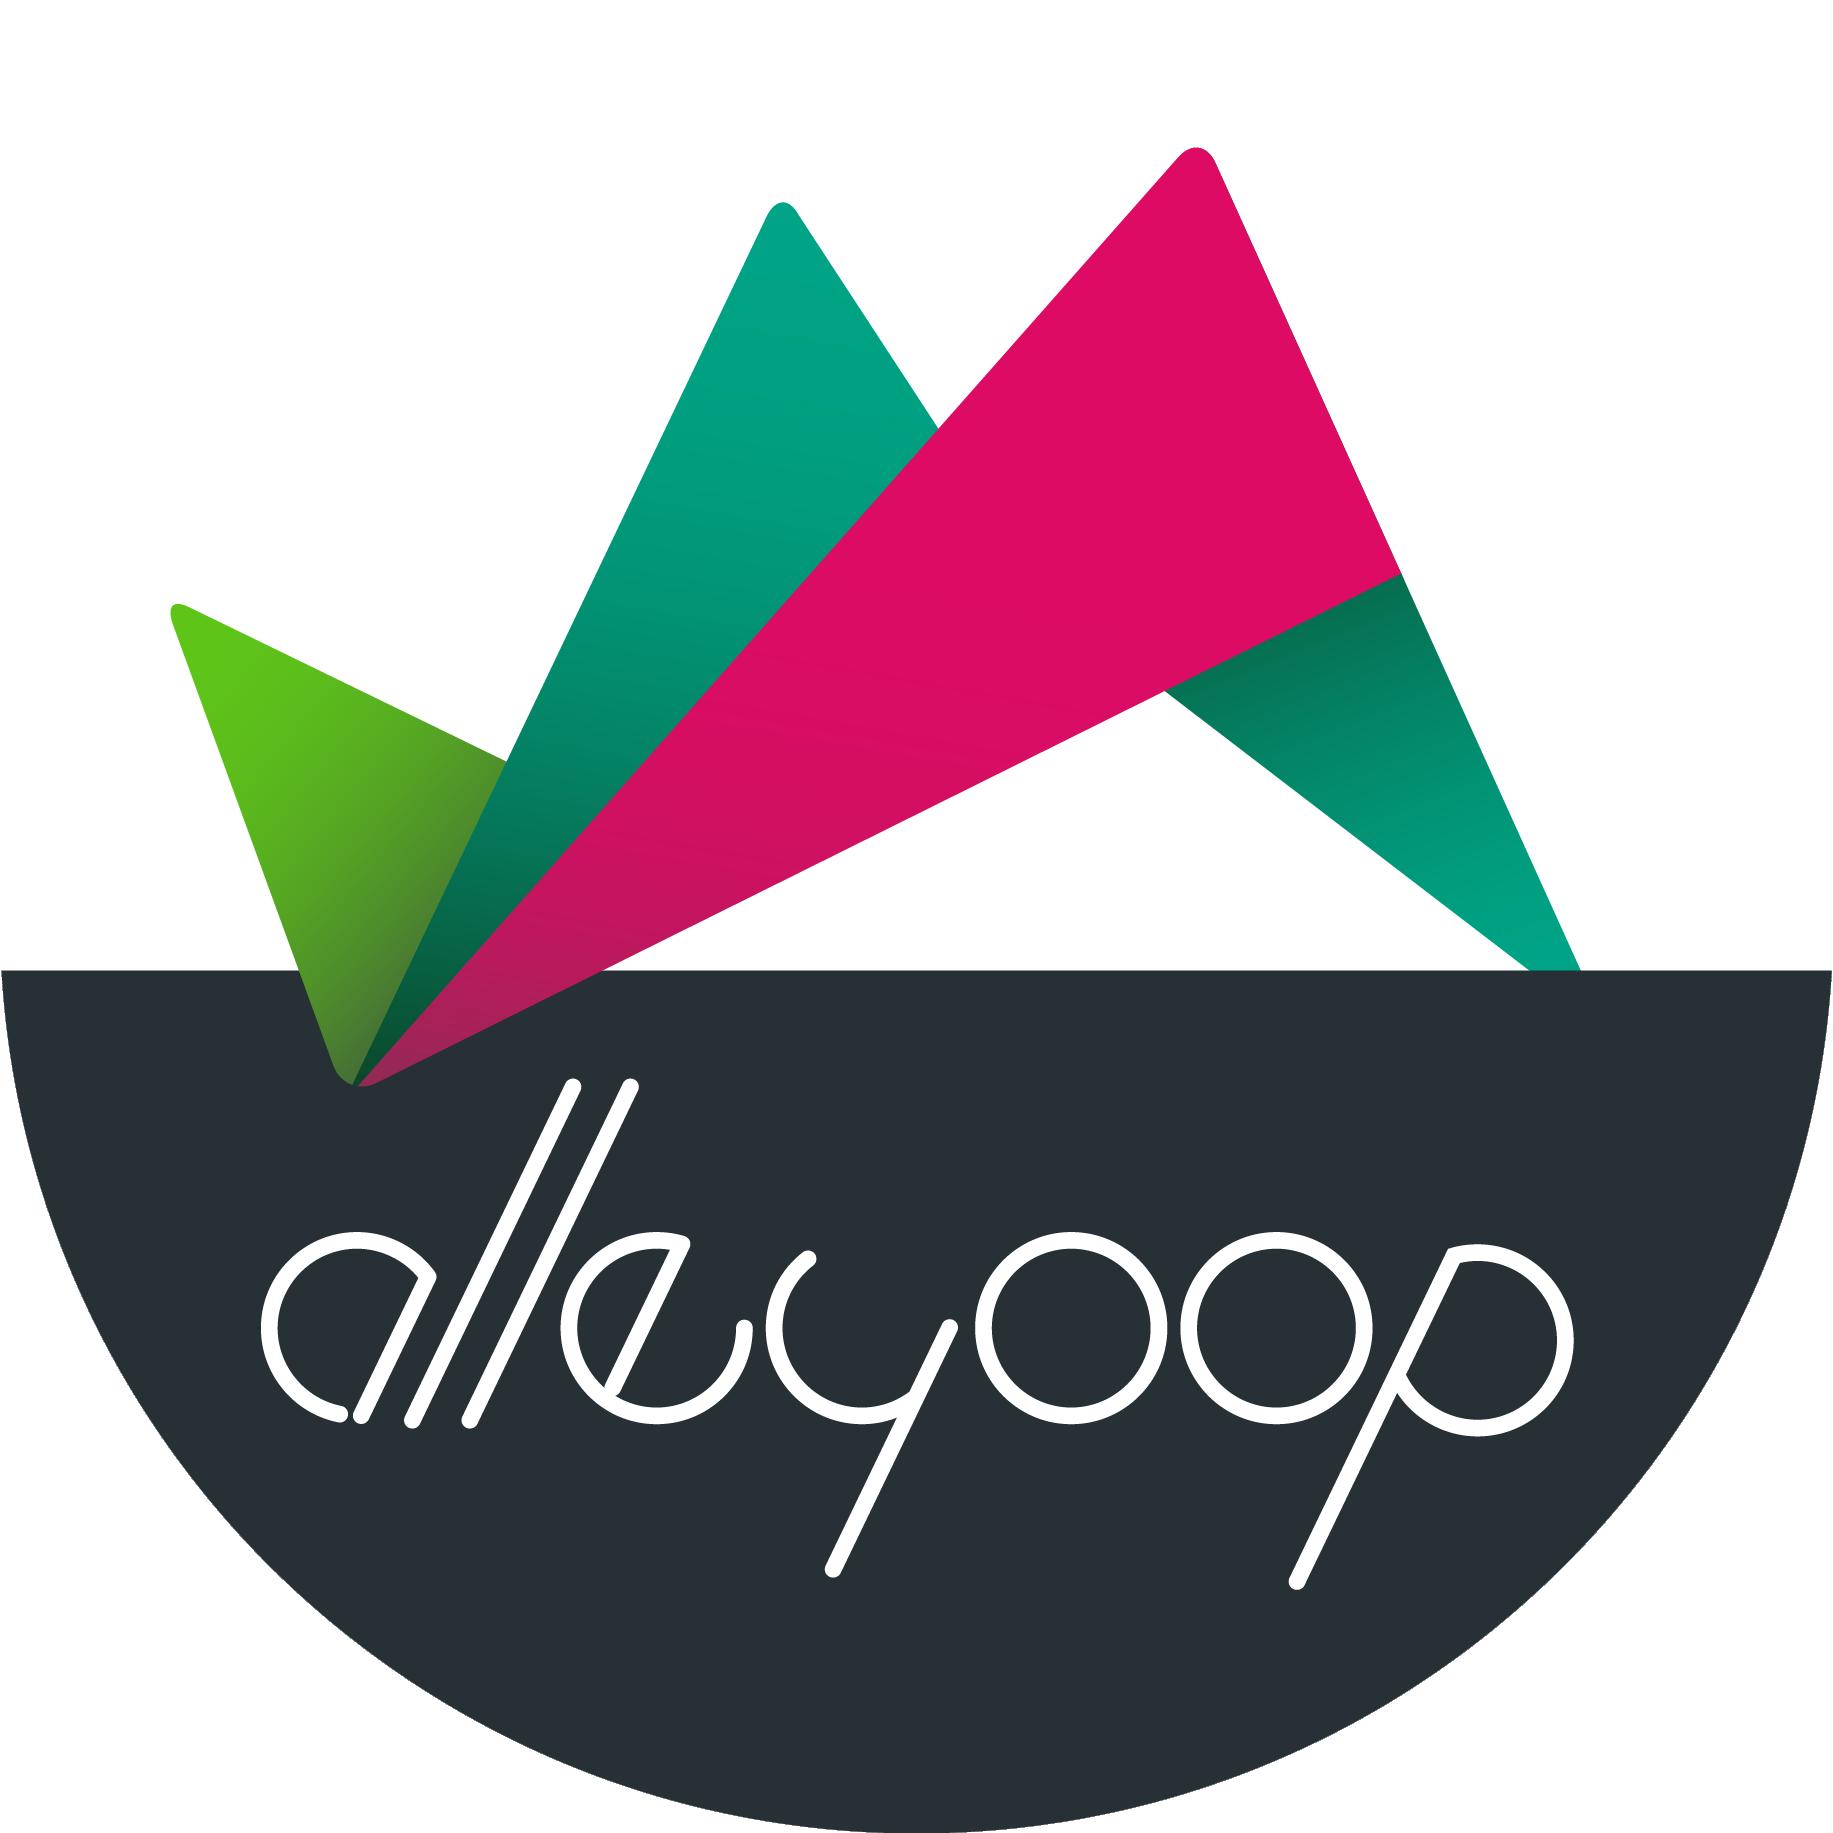 Alleyoop Combined - Circle.png